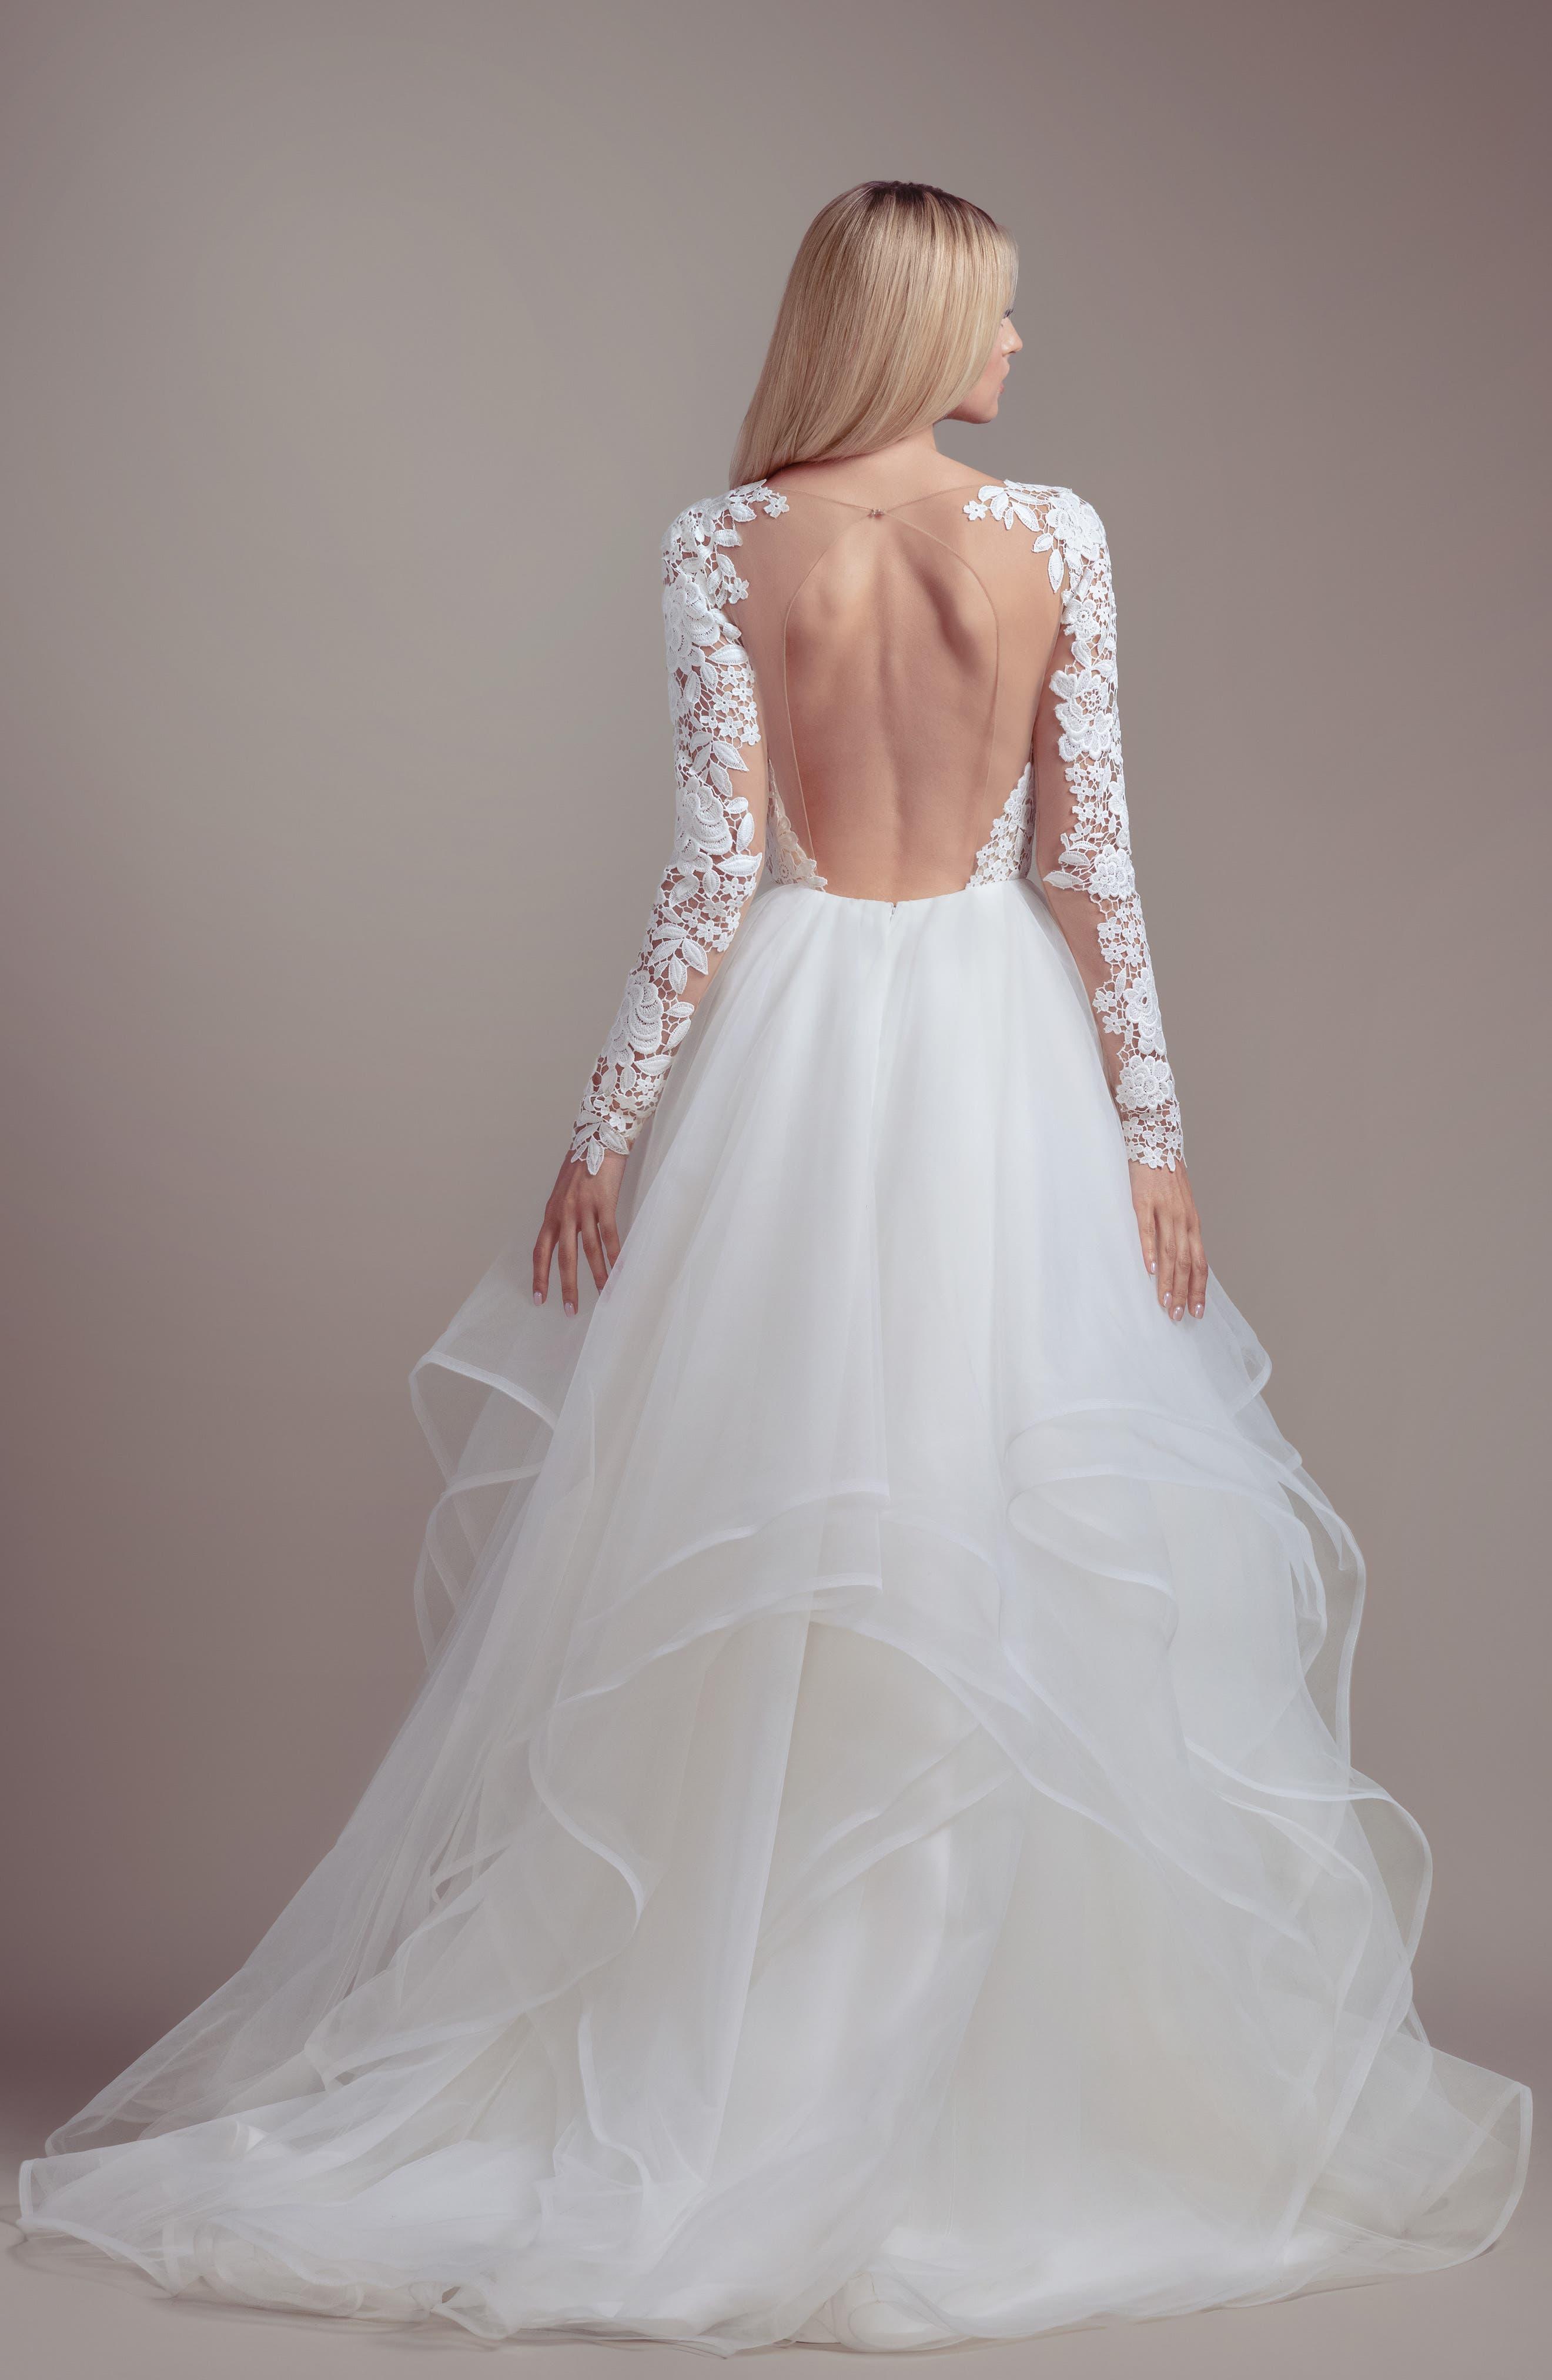 Praise Long Sleeve Lace & Tulle Wedding Dress,                             Alternate thumbnail 2, color,                             IVORY